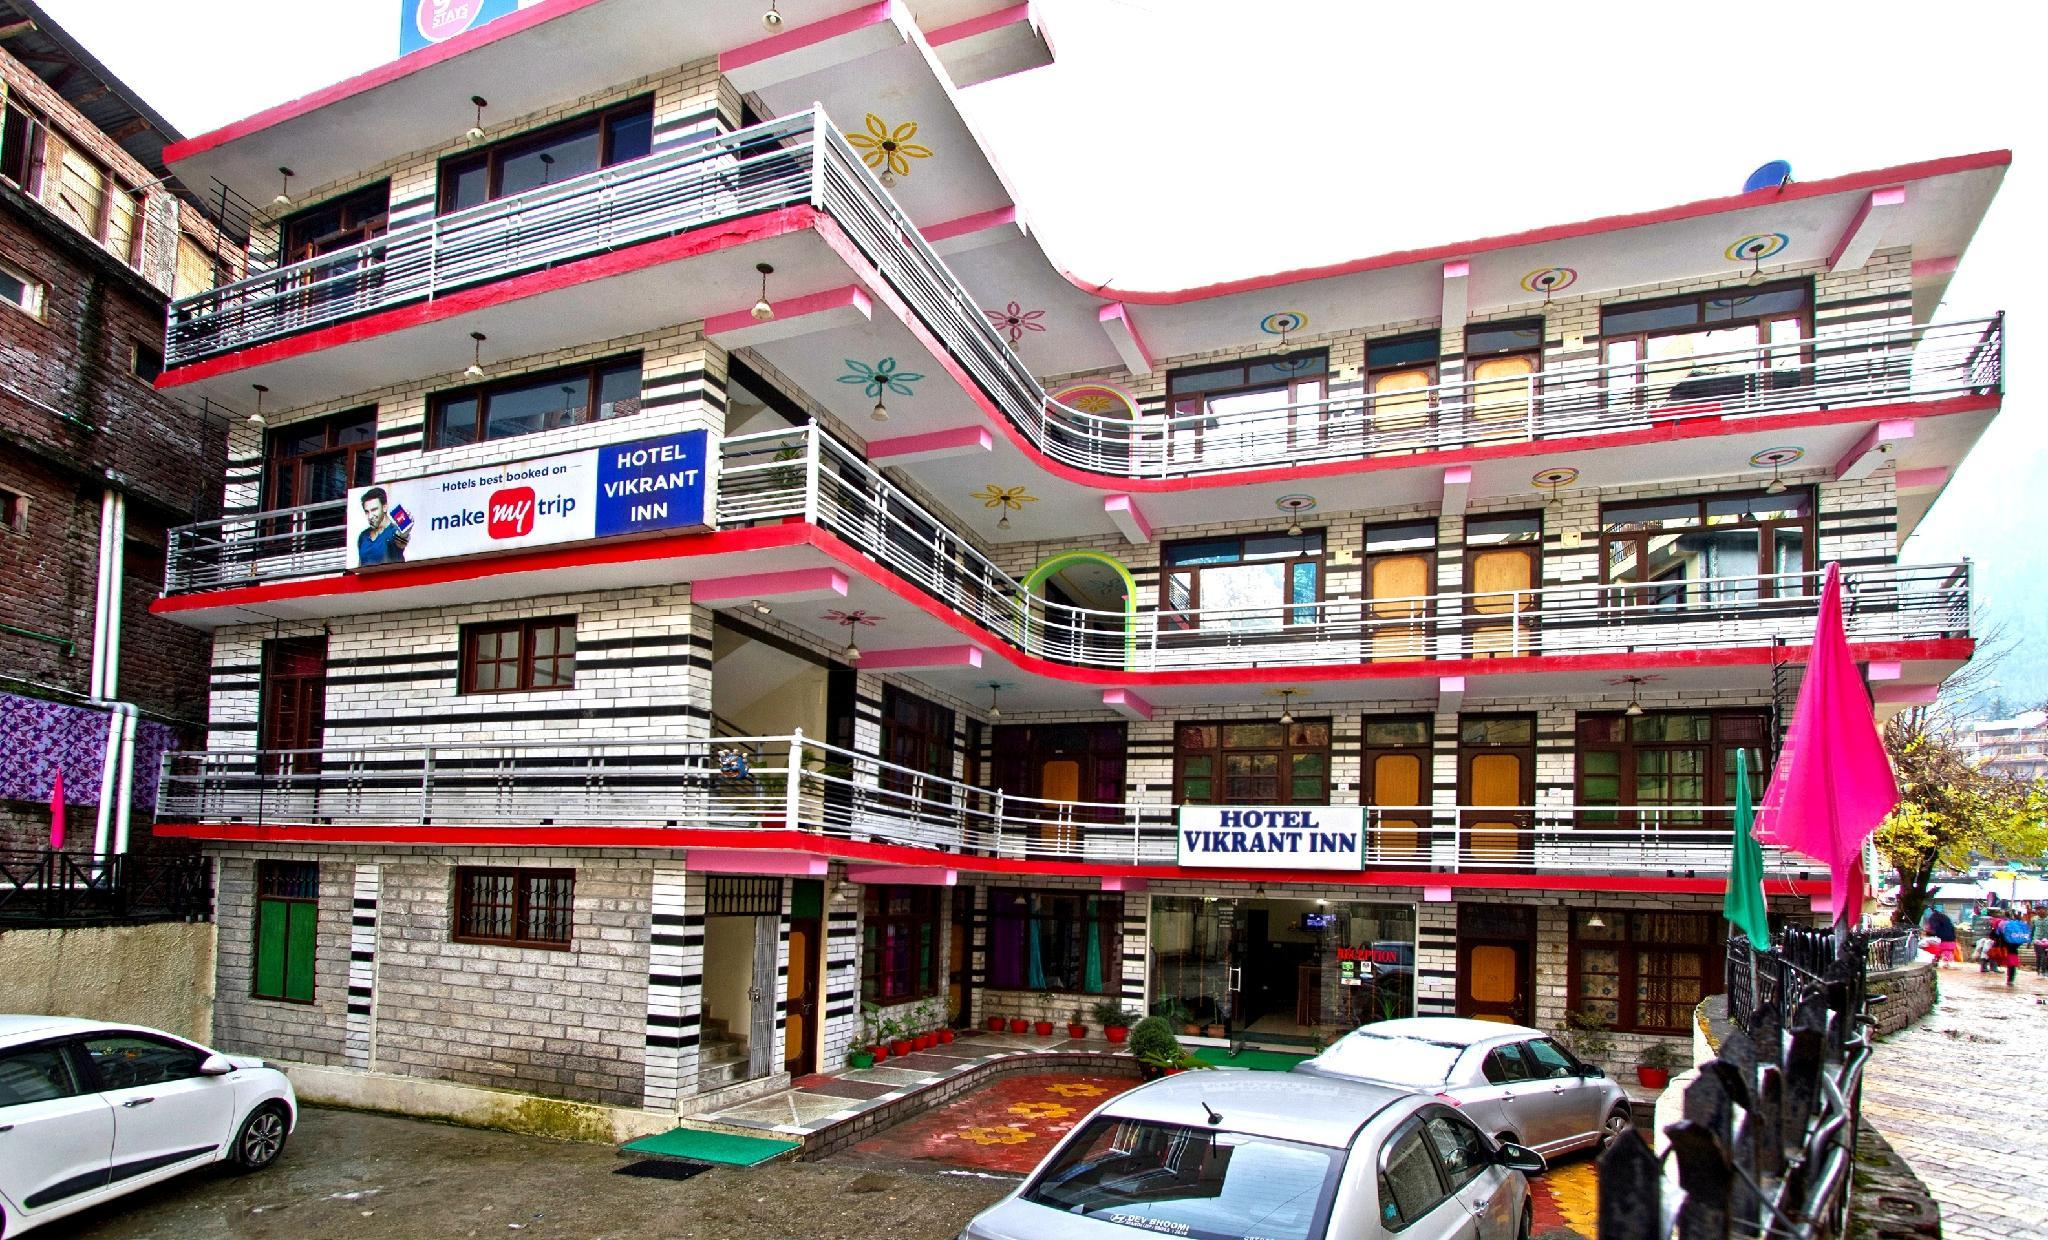 Vikrant Inn